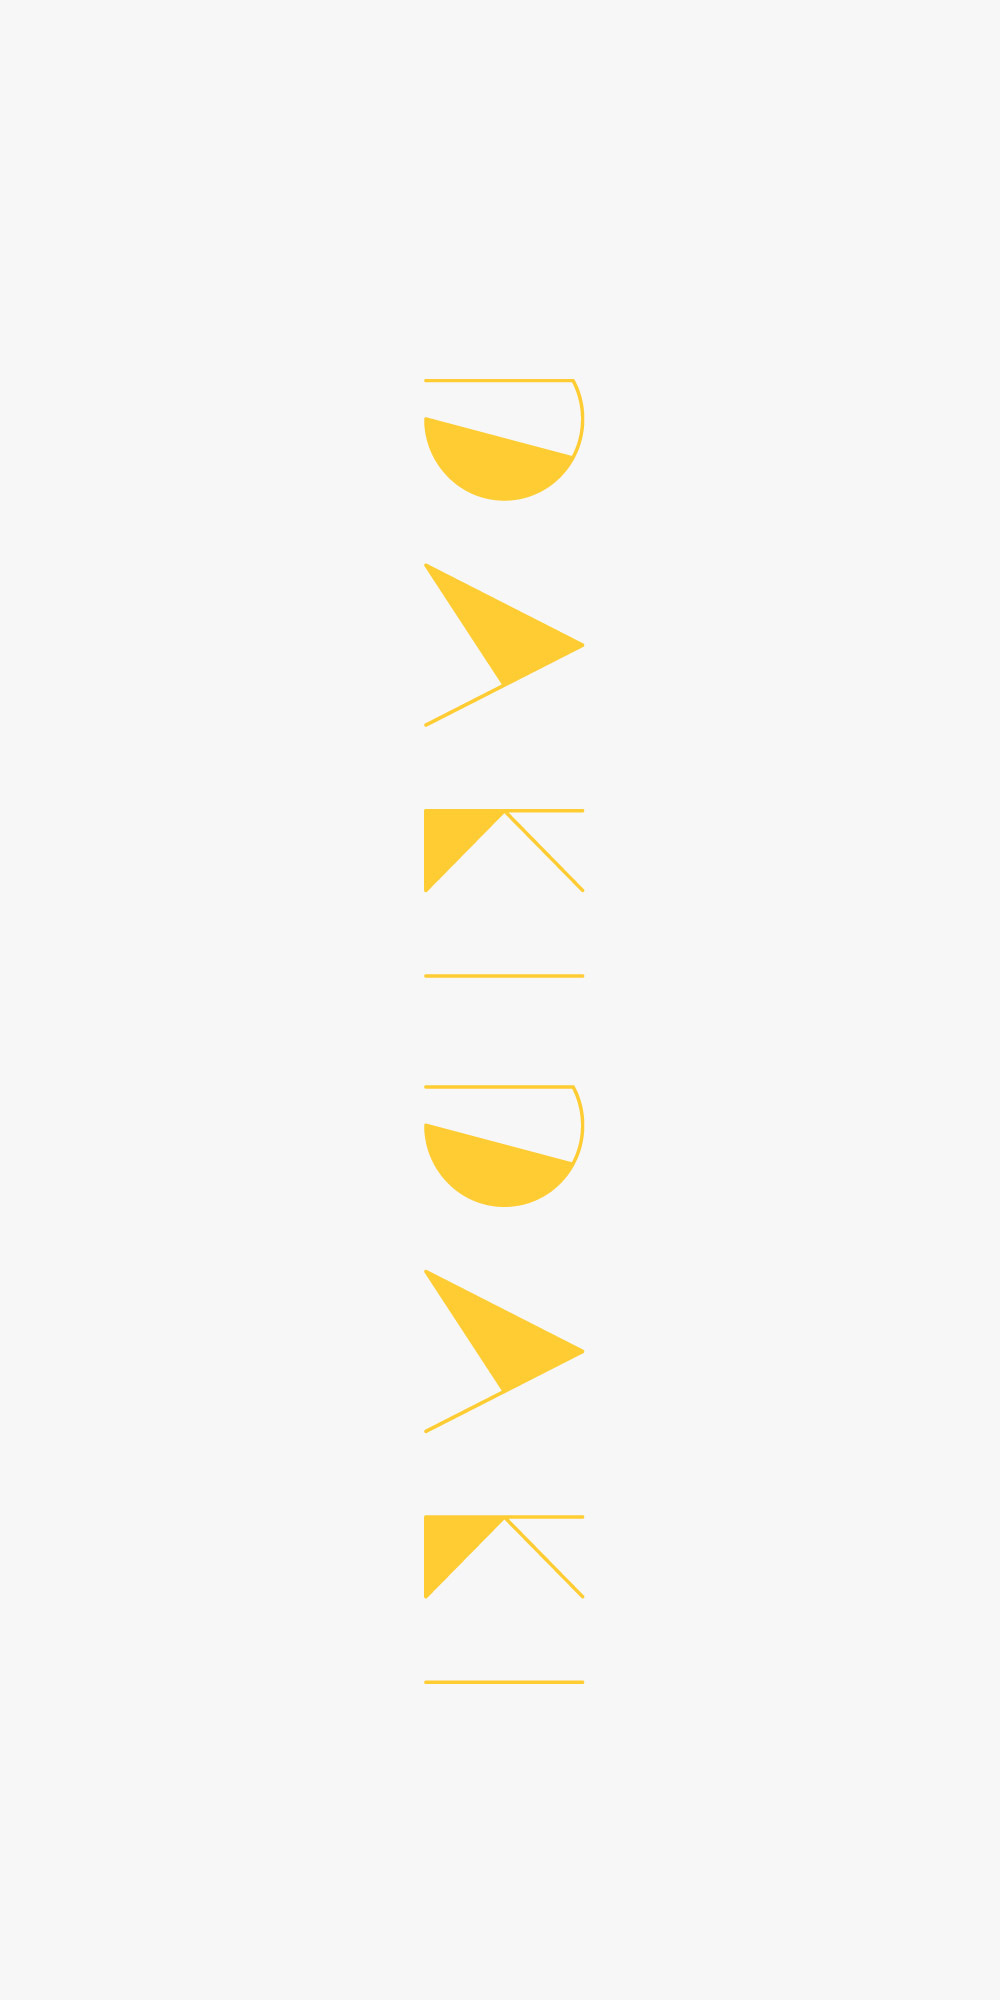 dakidaki-yellow.jpg